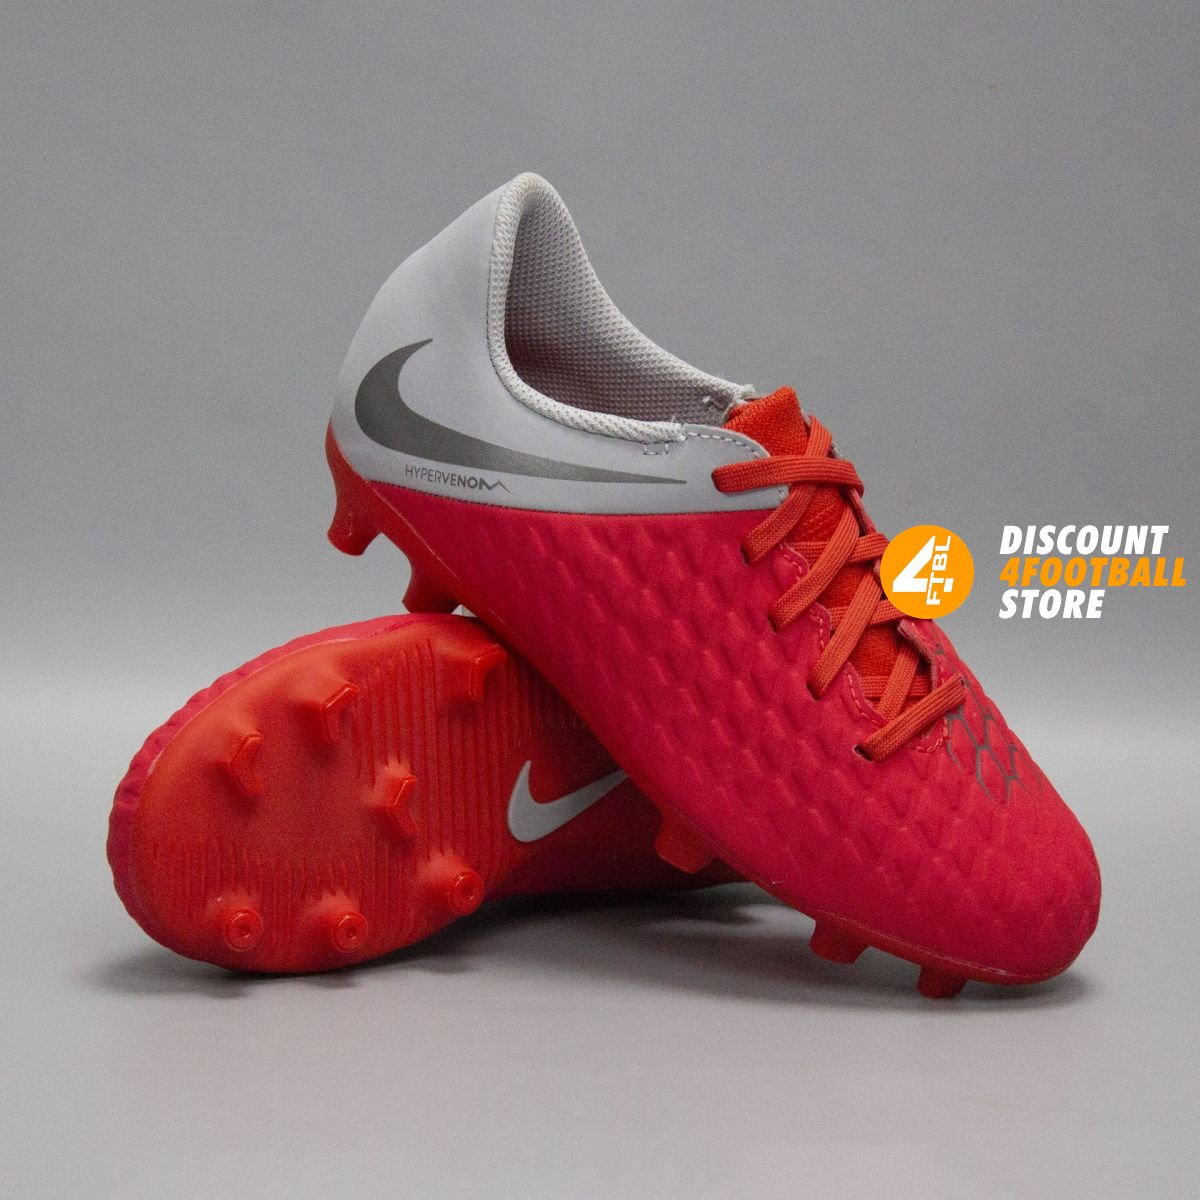 Детские футбольные бутсы Nike Hypervenom Сlub FG AJ4146-600 5b0d692e70950